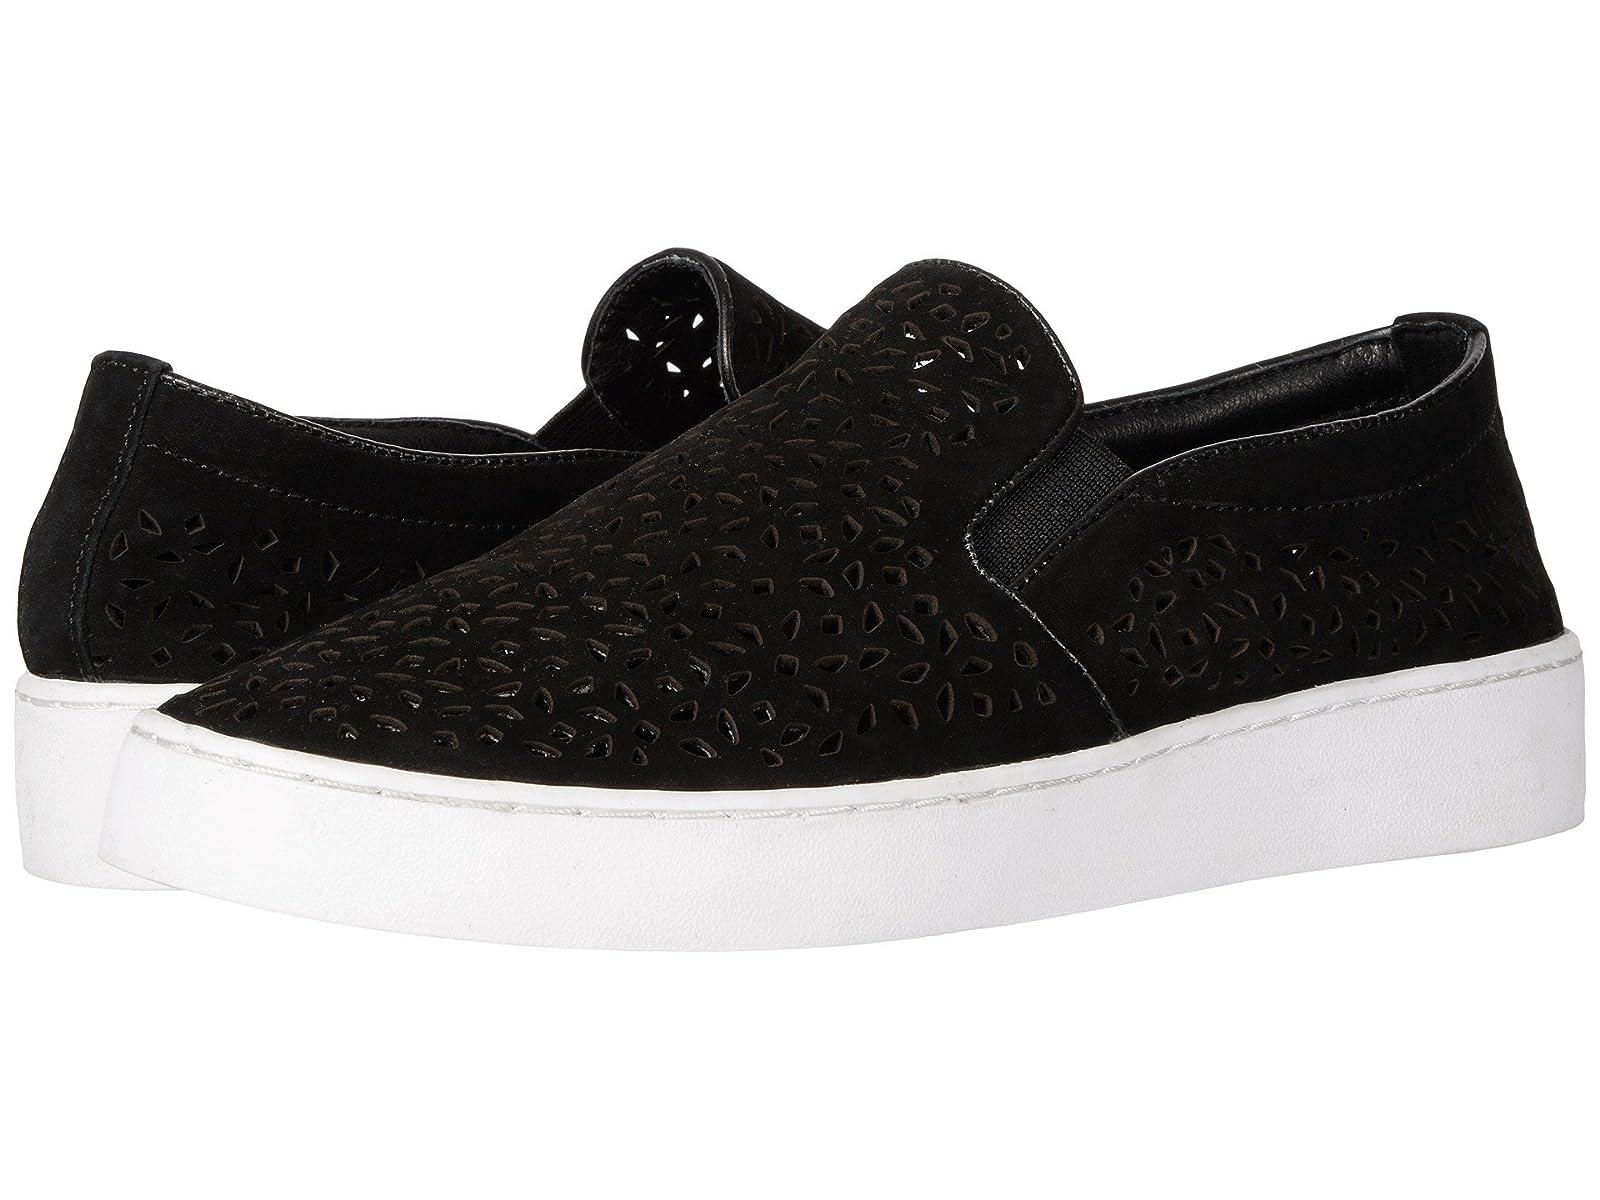 VIONIC Midi PerfAtmospheric grades have affordable shoes